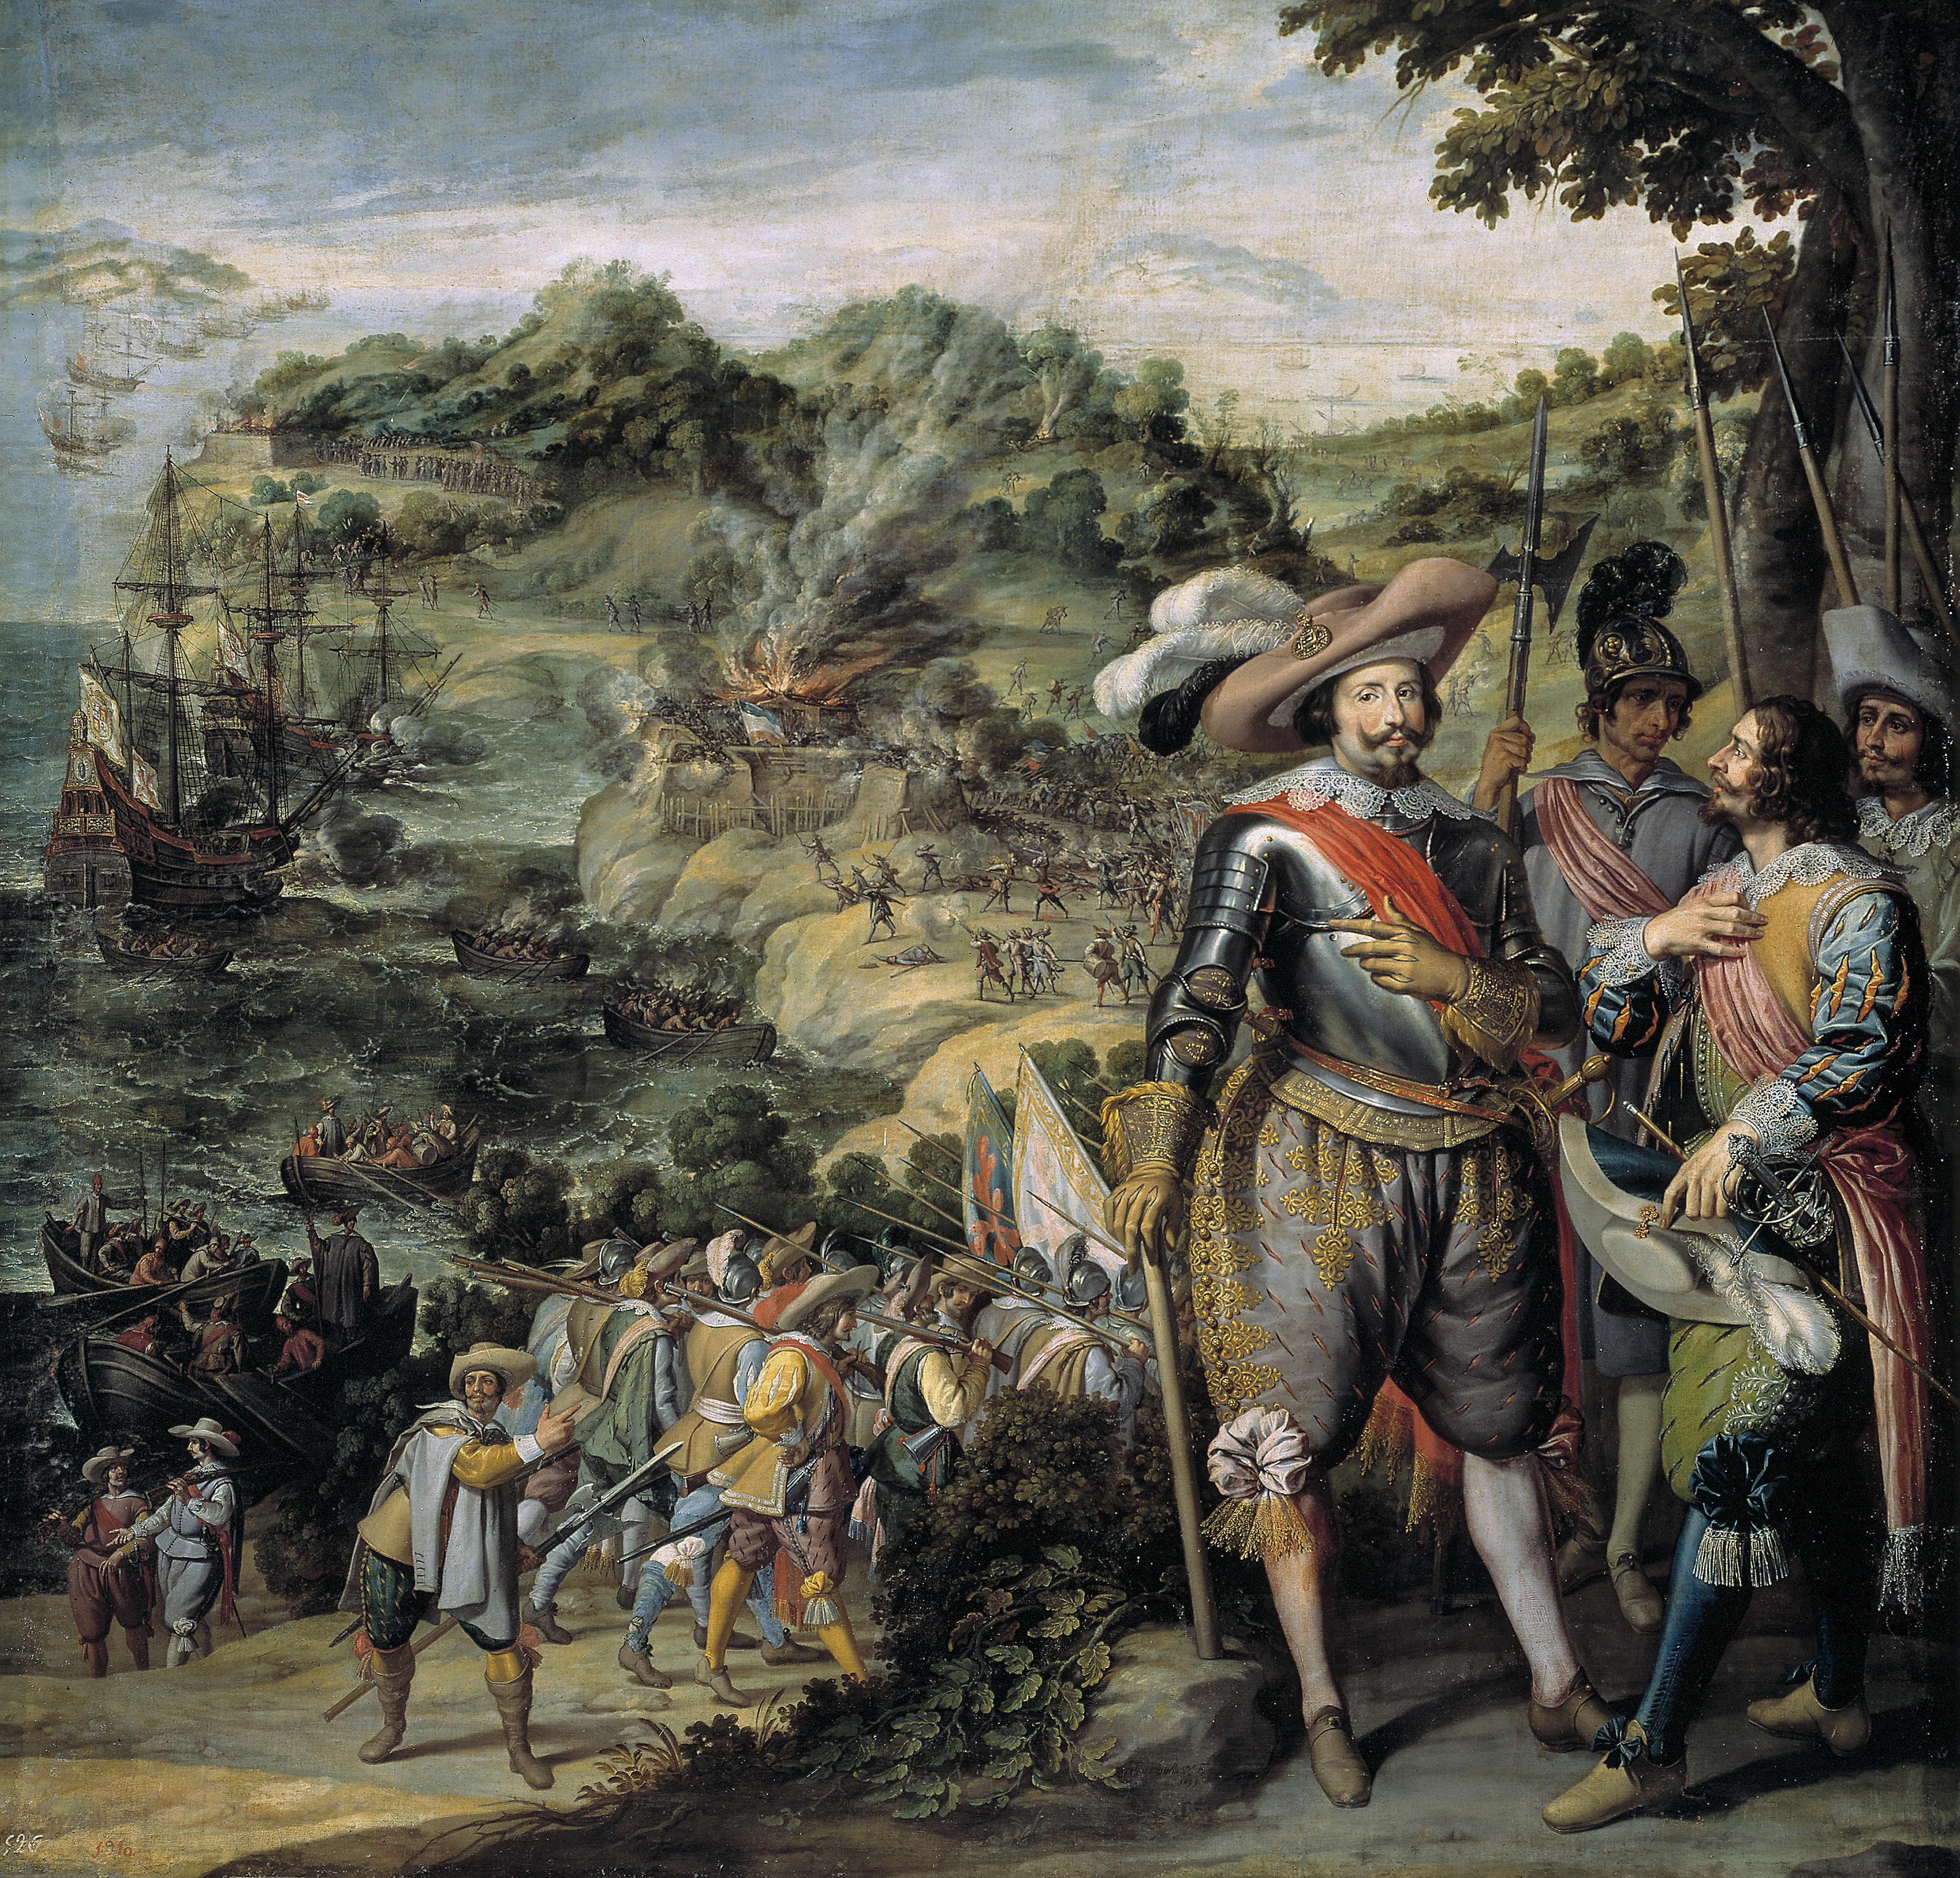 The Spanish capture of Saint Kitts by Don Fadrique de Toledo in 1629.